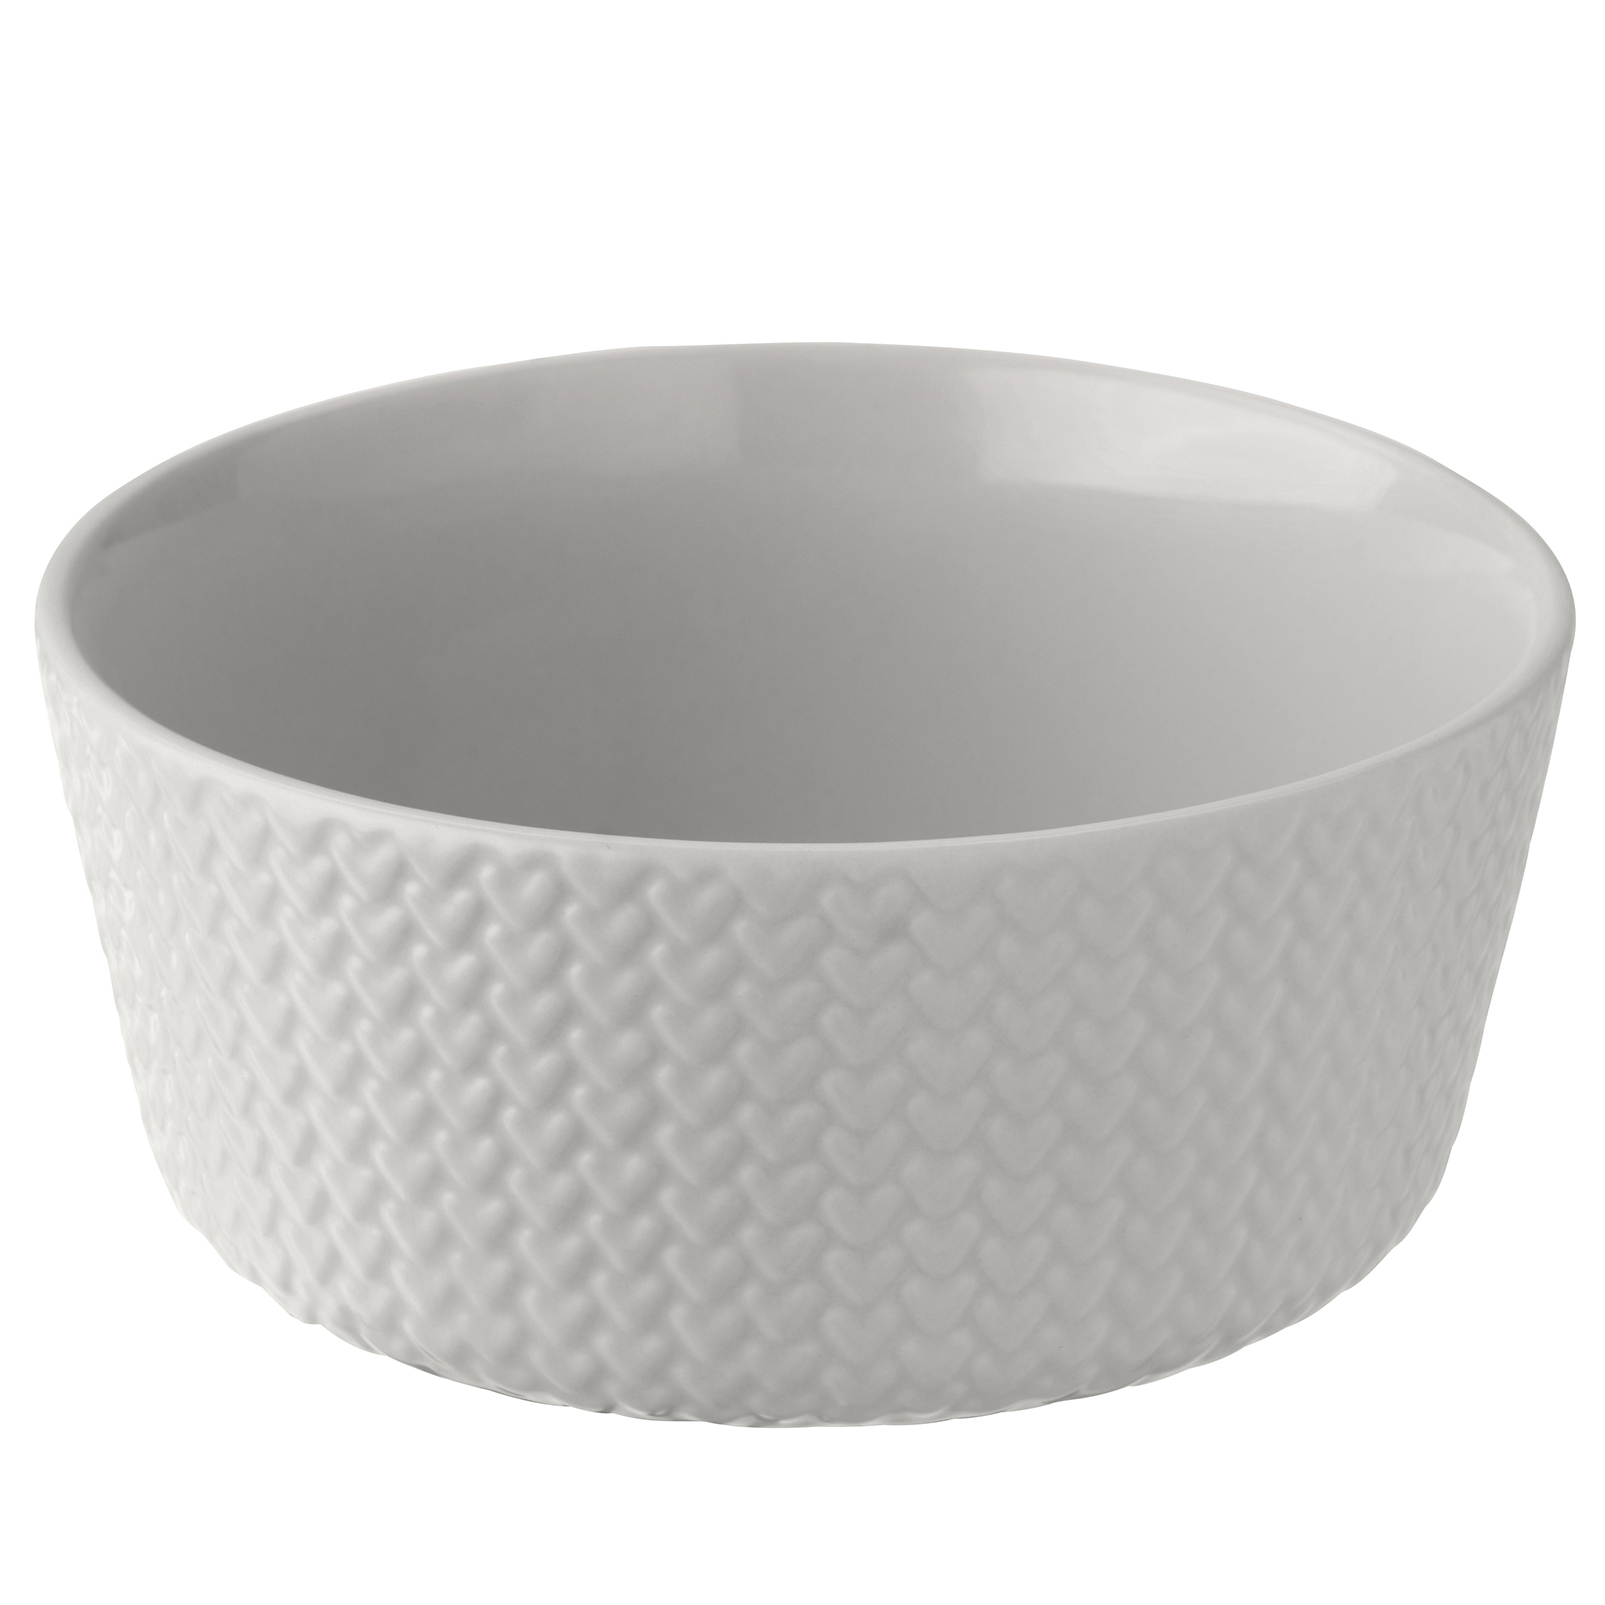 IKEA_VINTER2017_skal_monstrad_ljusgra_PE646250.jpg